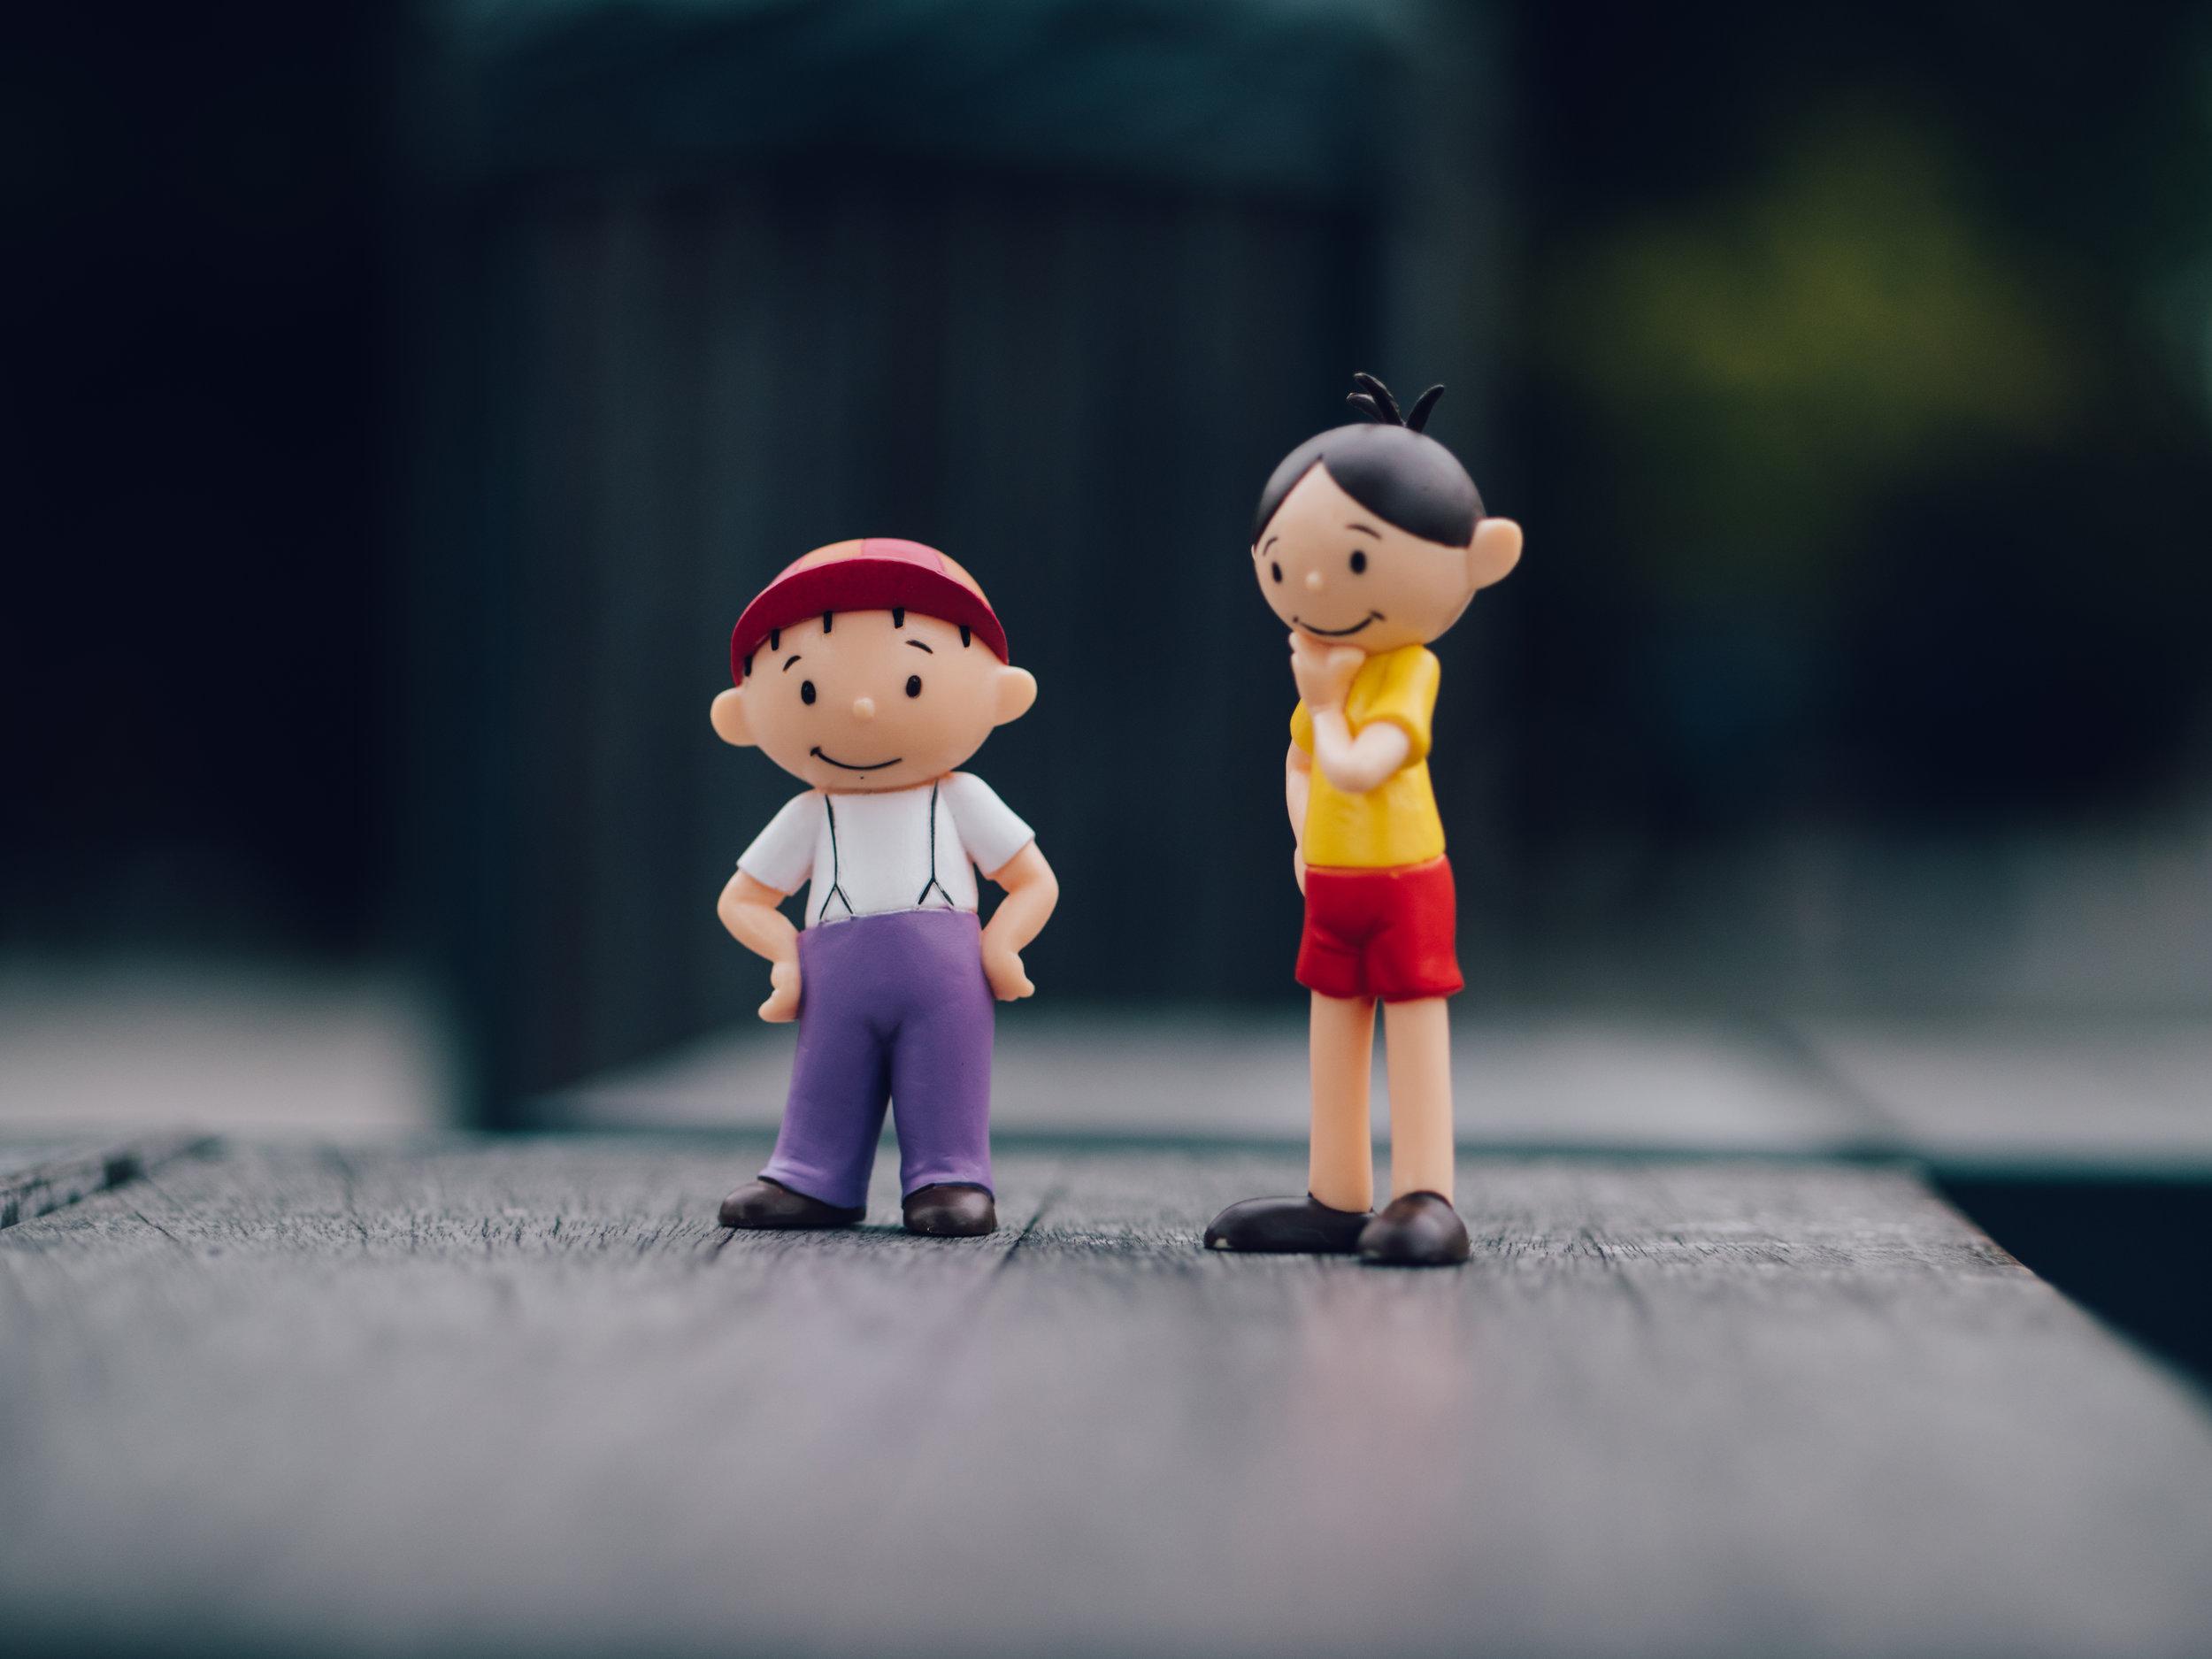 Sunday Ethical Educationfor Kids - (SEEK)